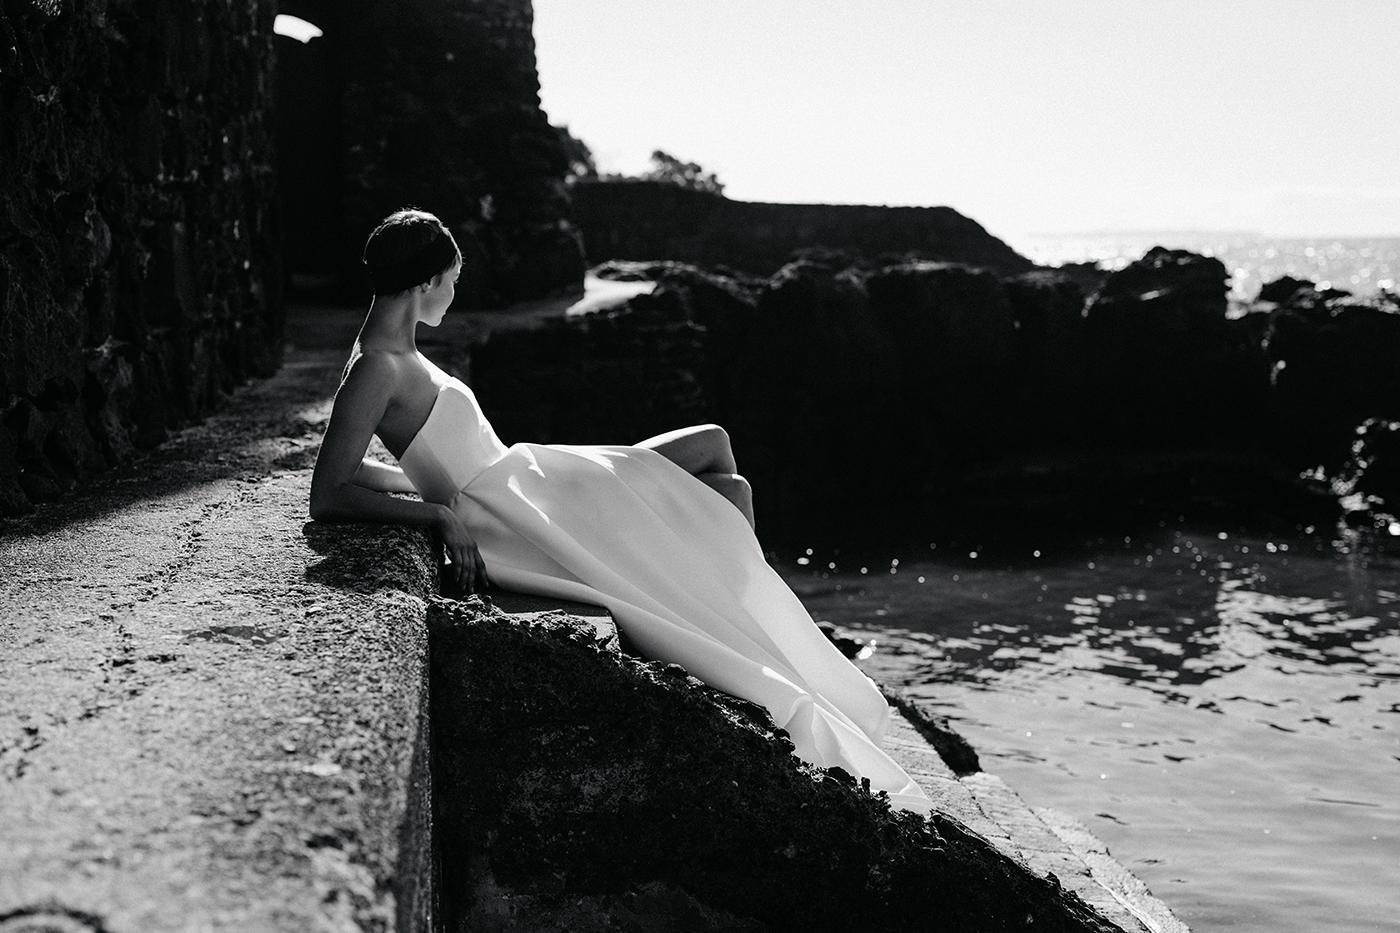 Yuila Gown